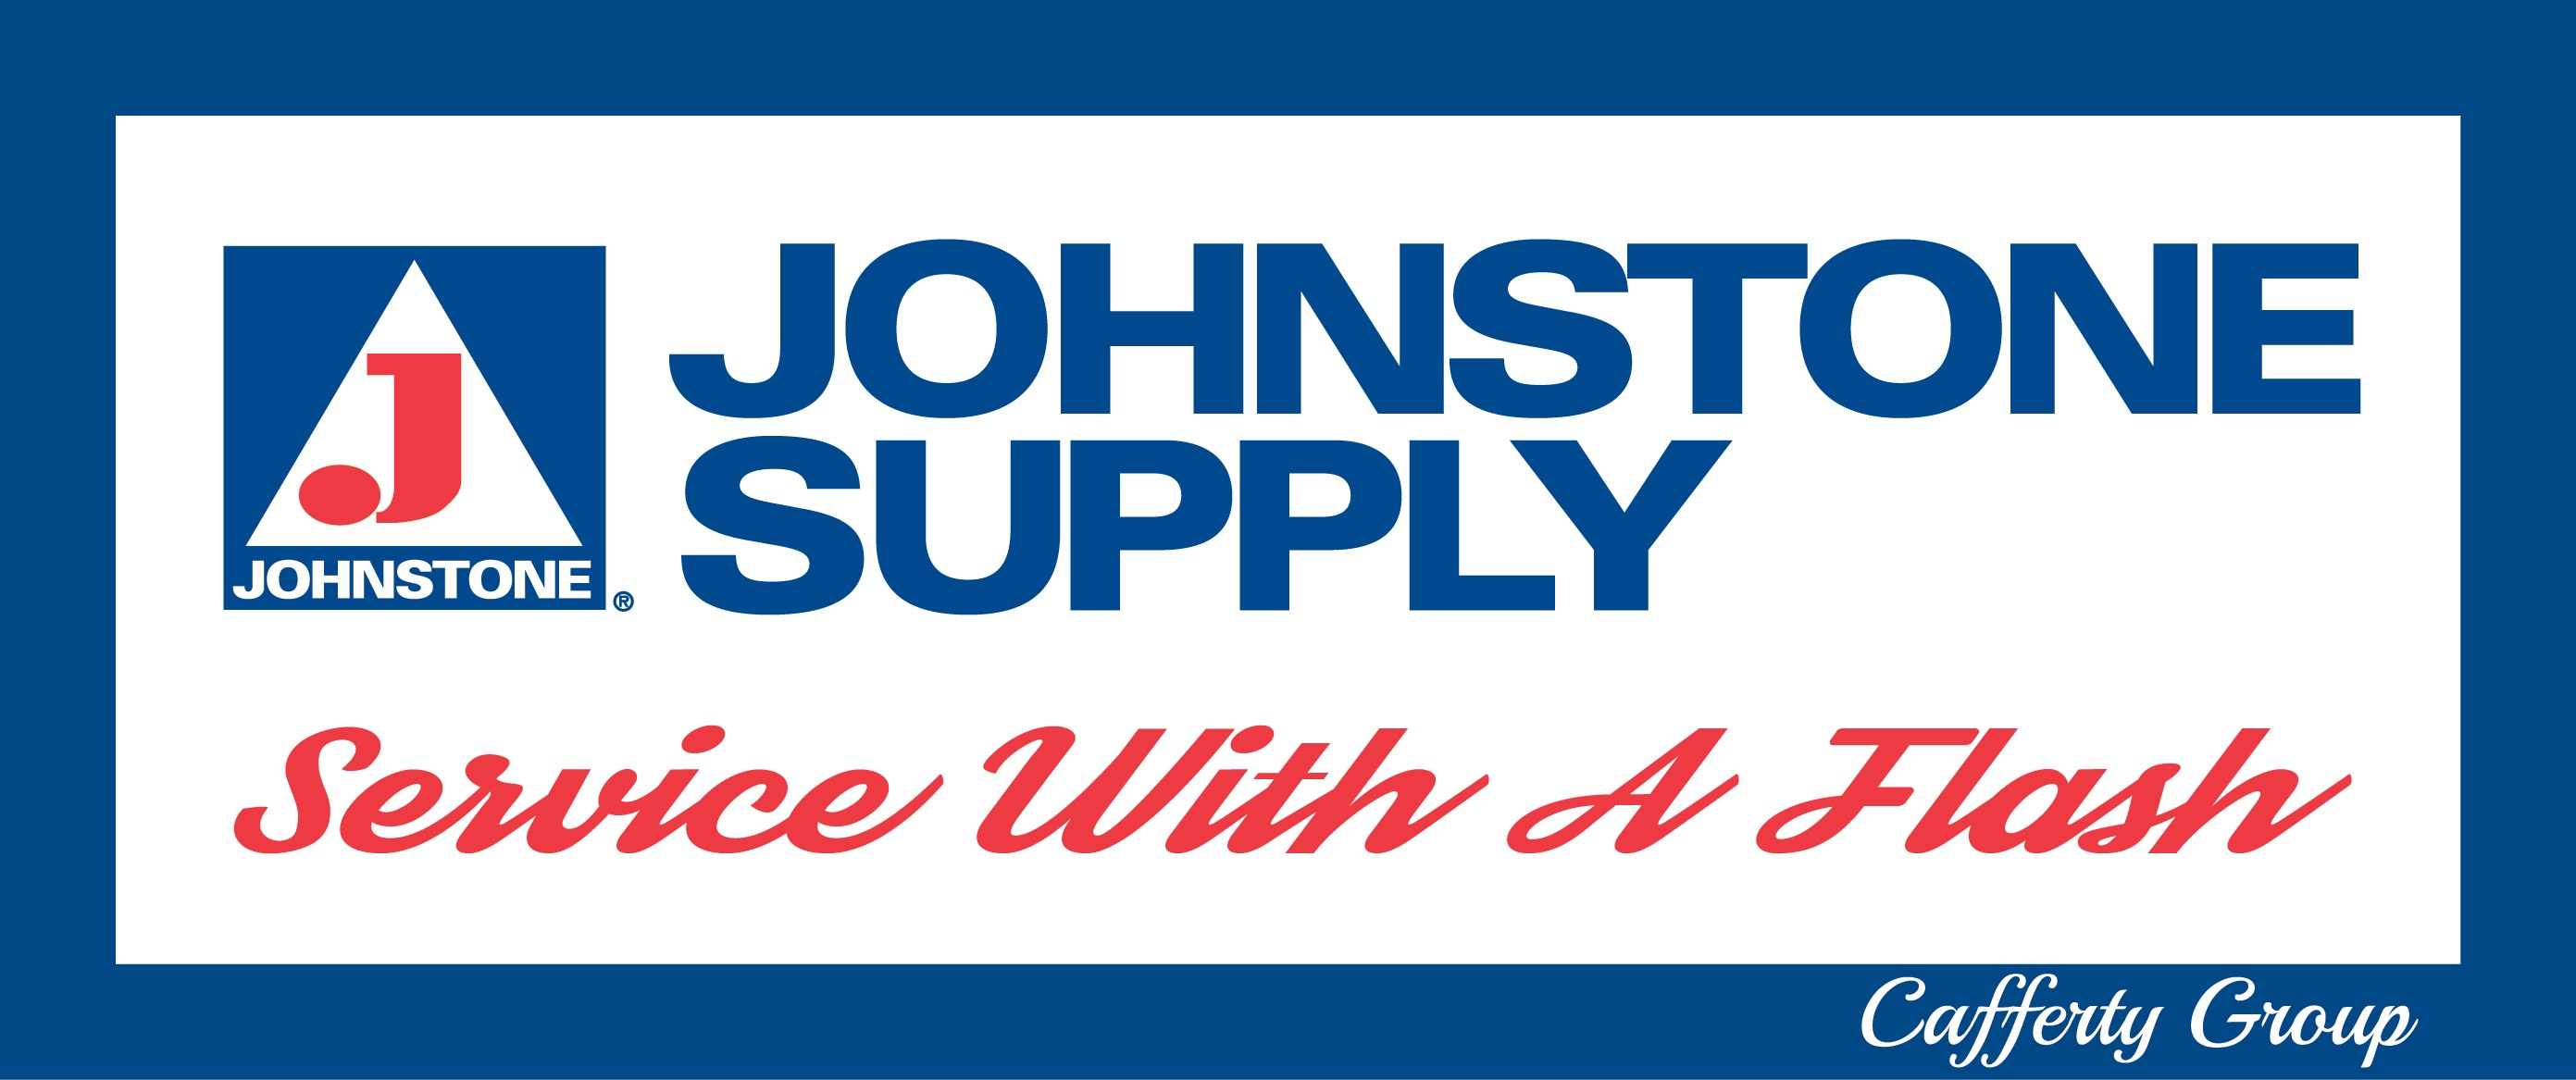 Johnstone Supply - The Cafferty Group | LinkedIn